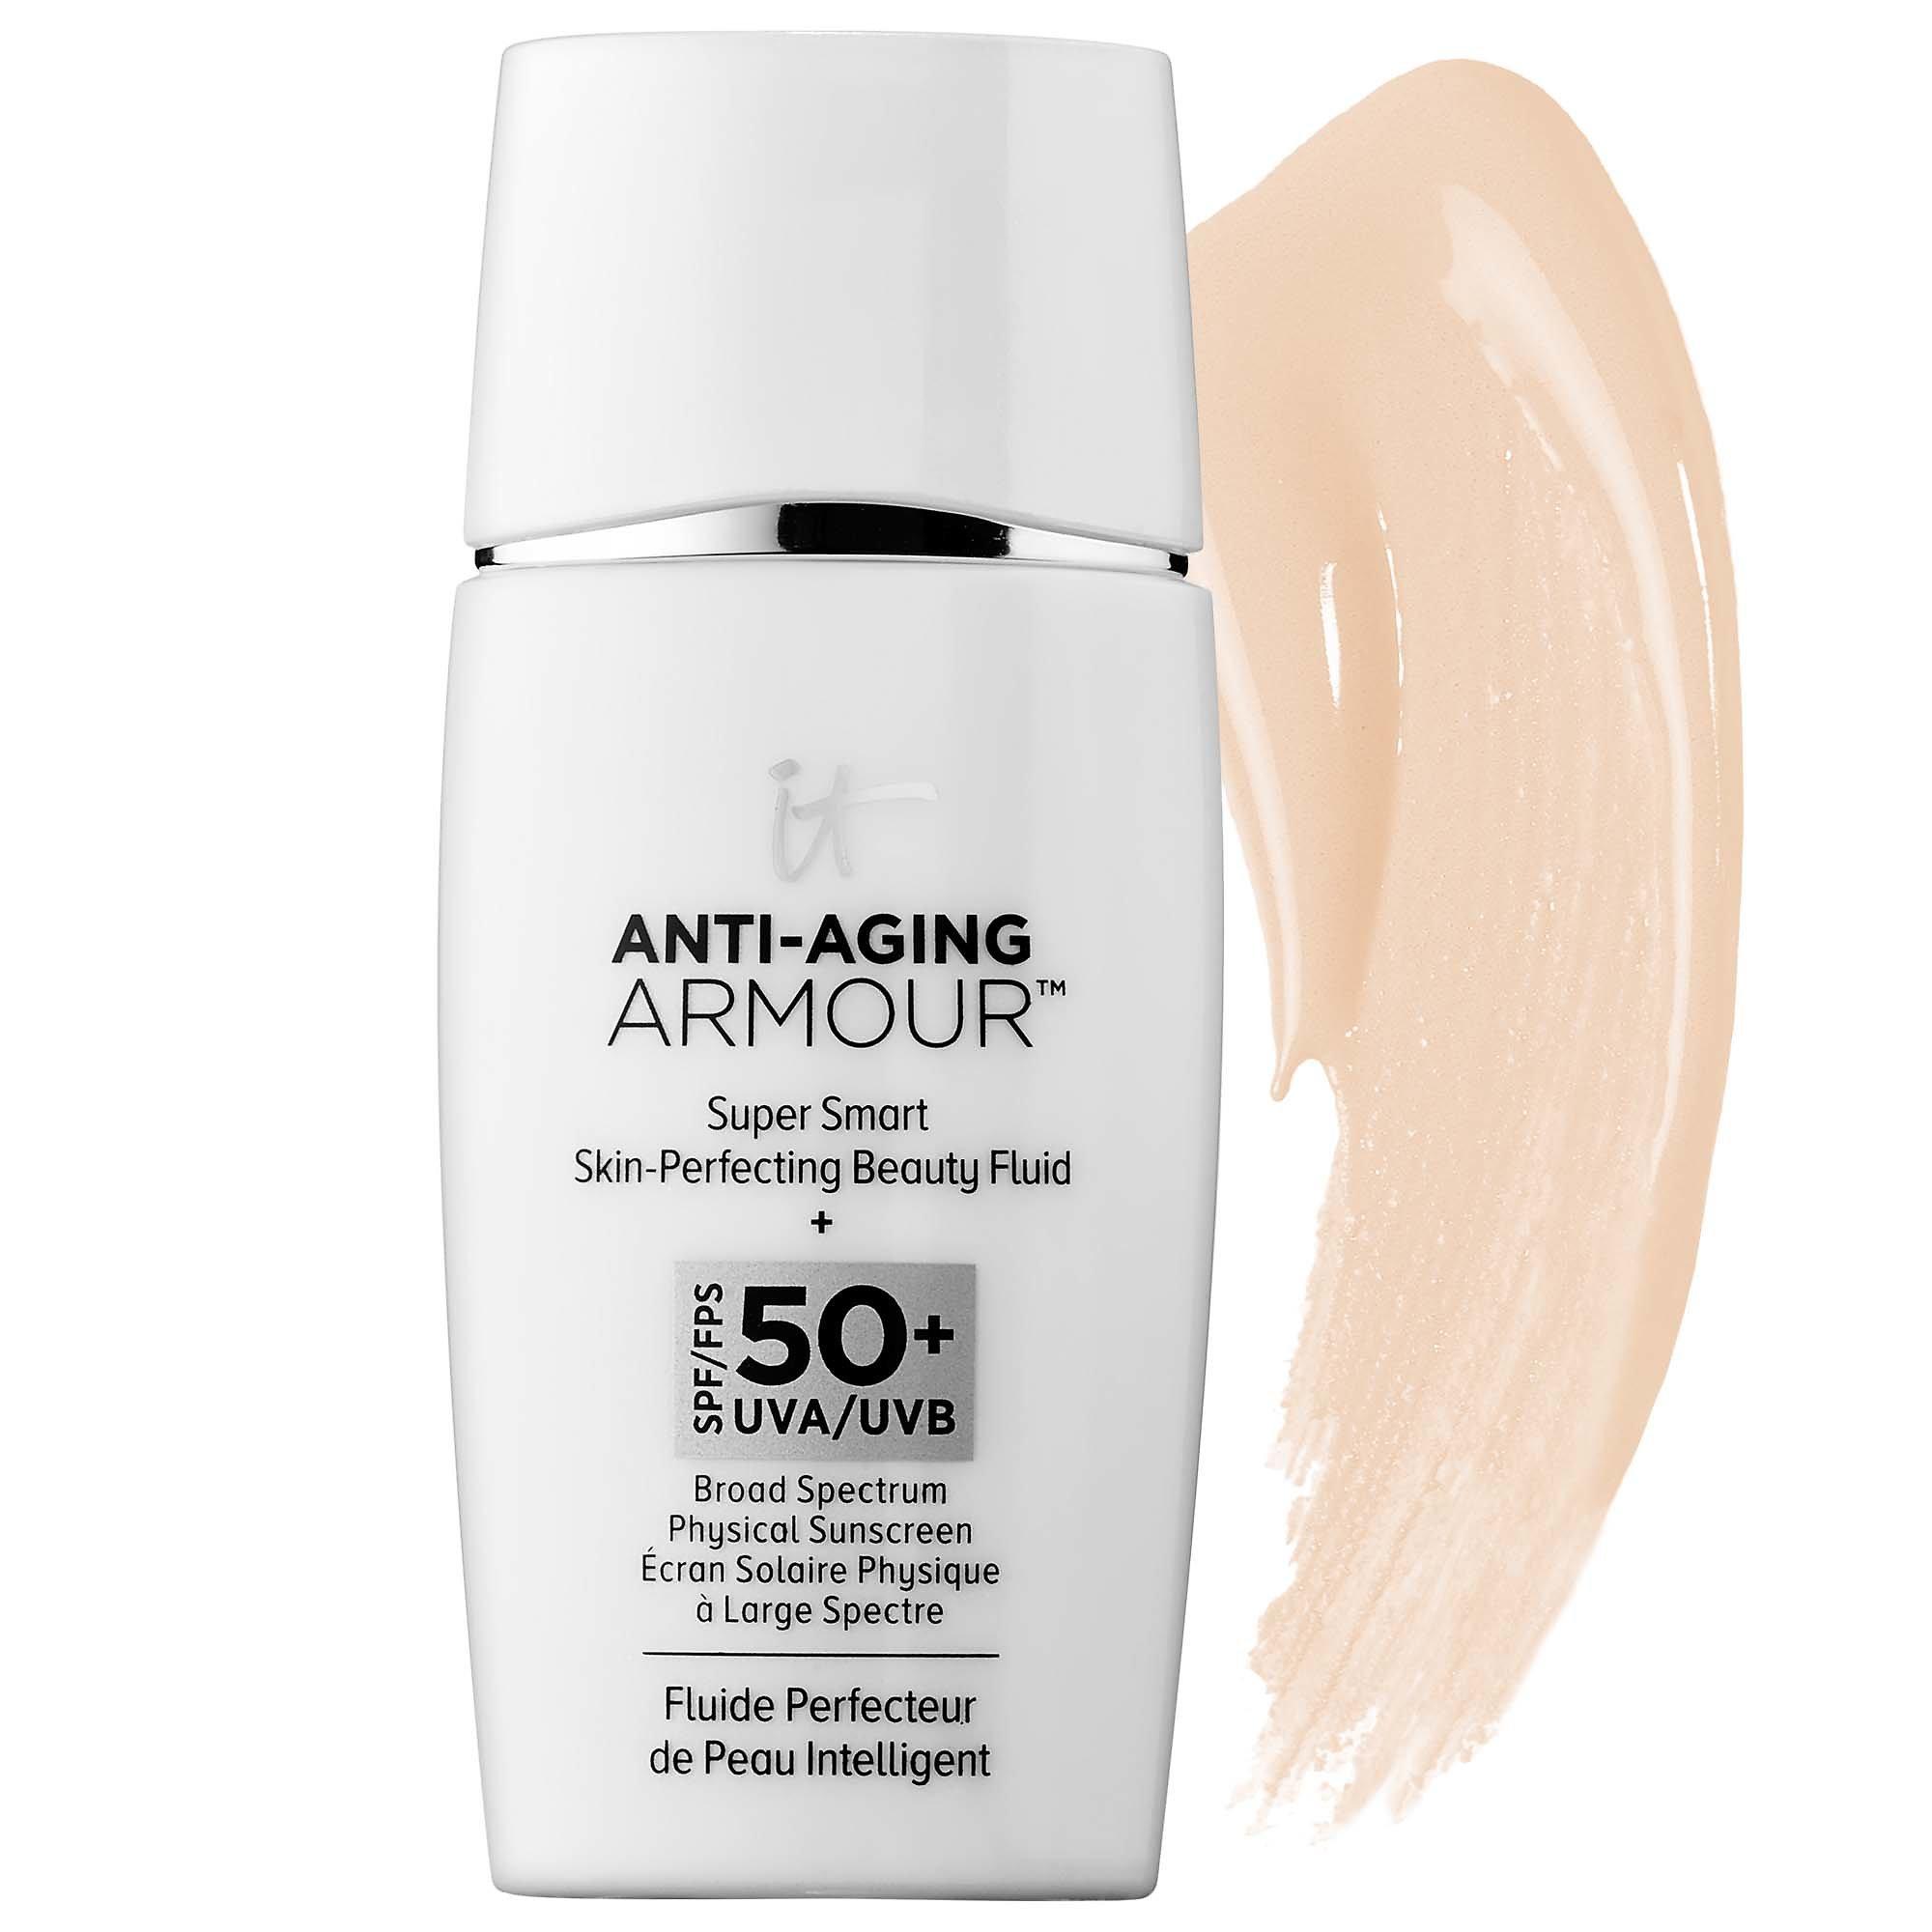 IT Cosmetics Anti-Aging Armour Super Smart Skin-Perfecting Beauty Fluid SPF 50+